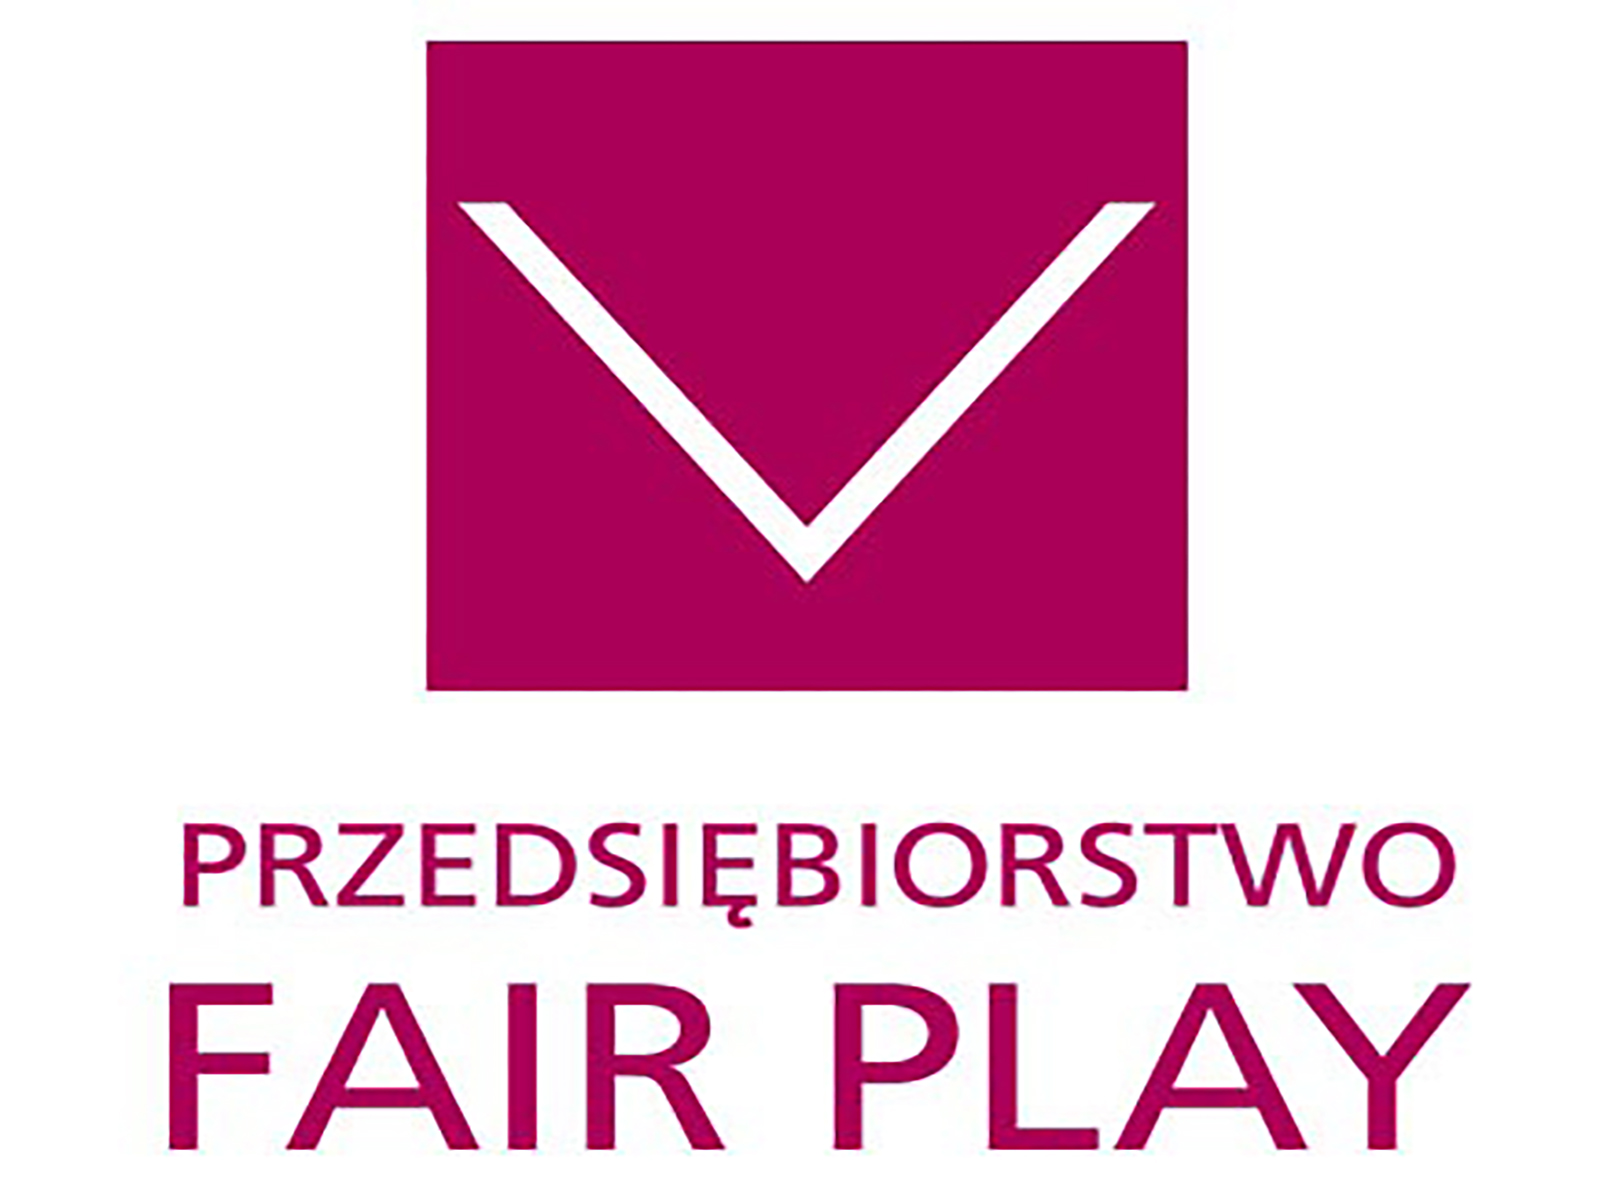 fair_play-1